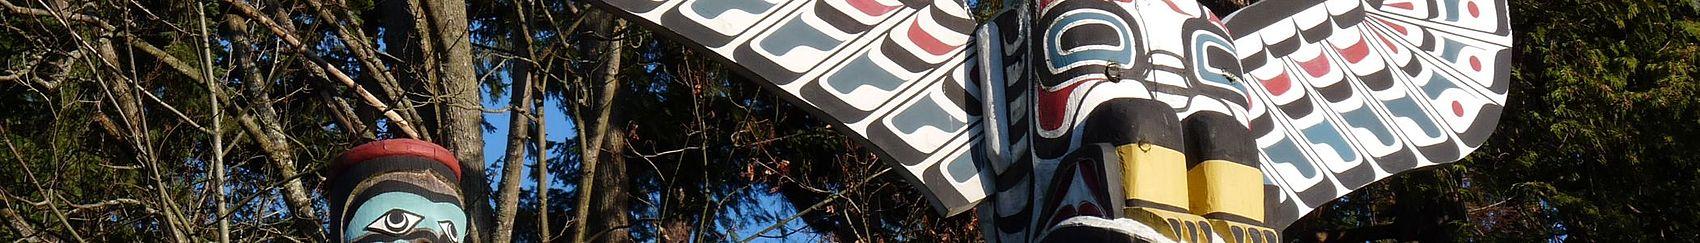 Vancouver banner Stanley park totems.jpg